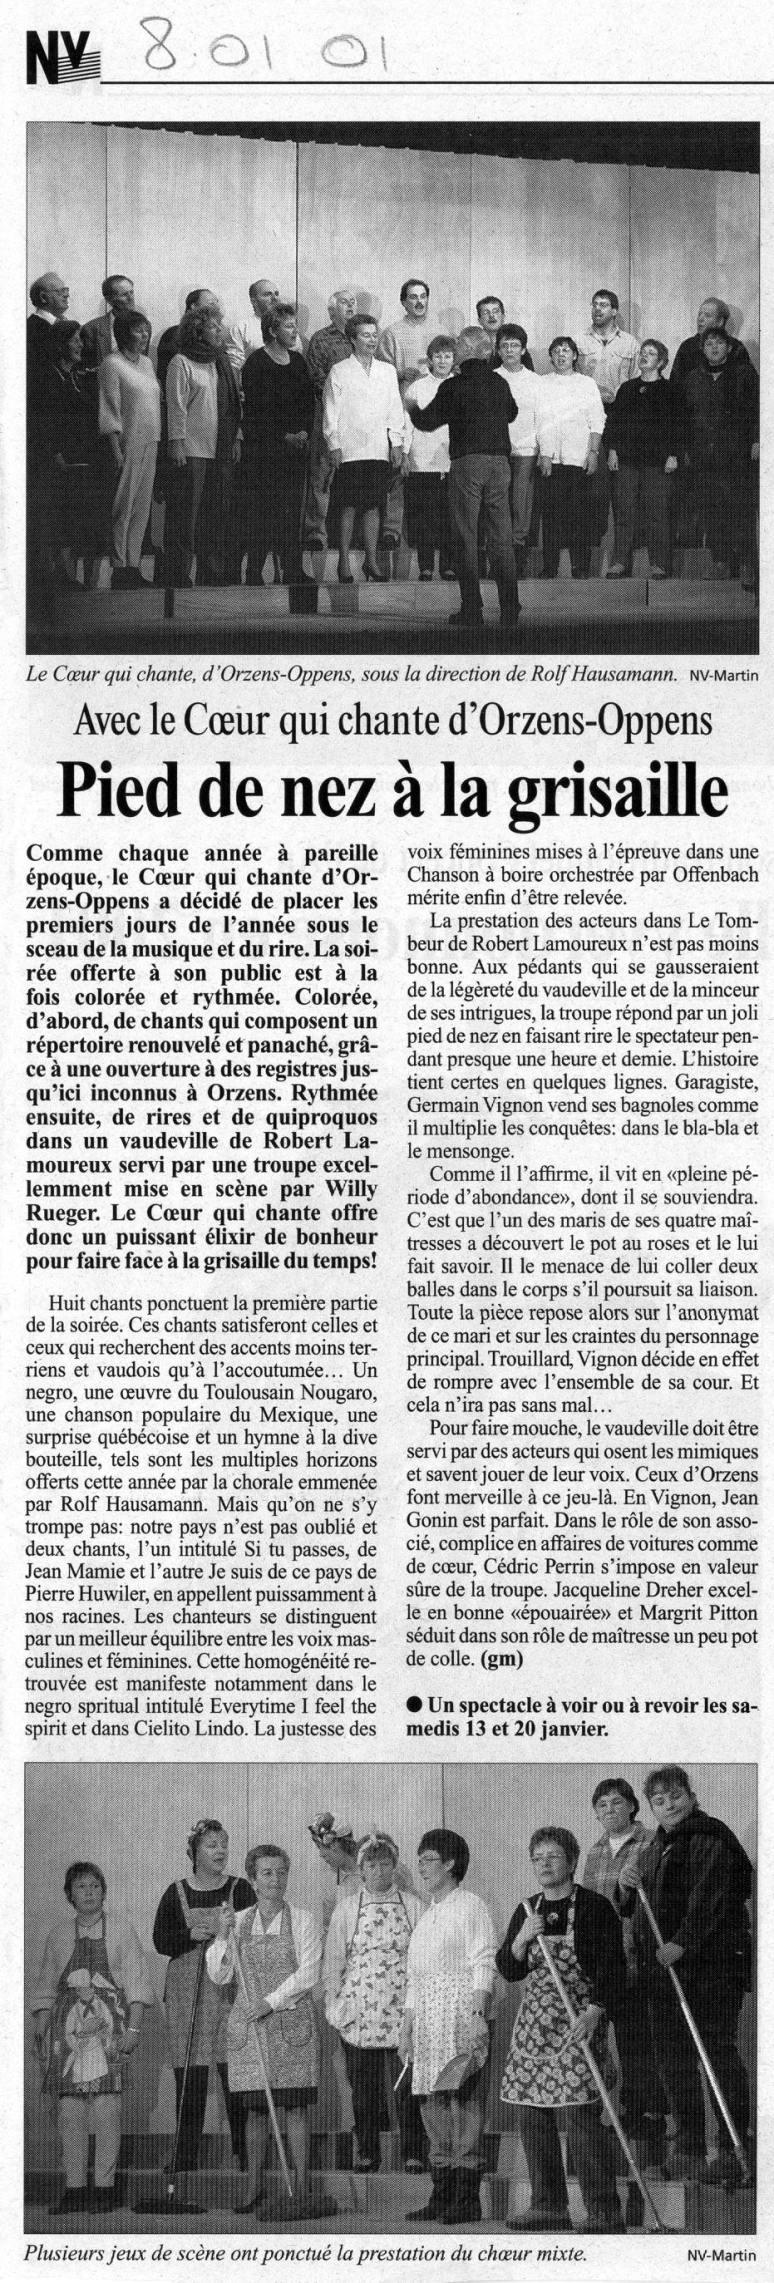 JOURNAL NV 08 janvier 2001 LE TOMBEUR Orzens